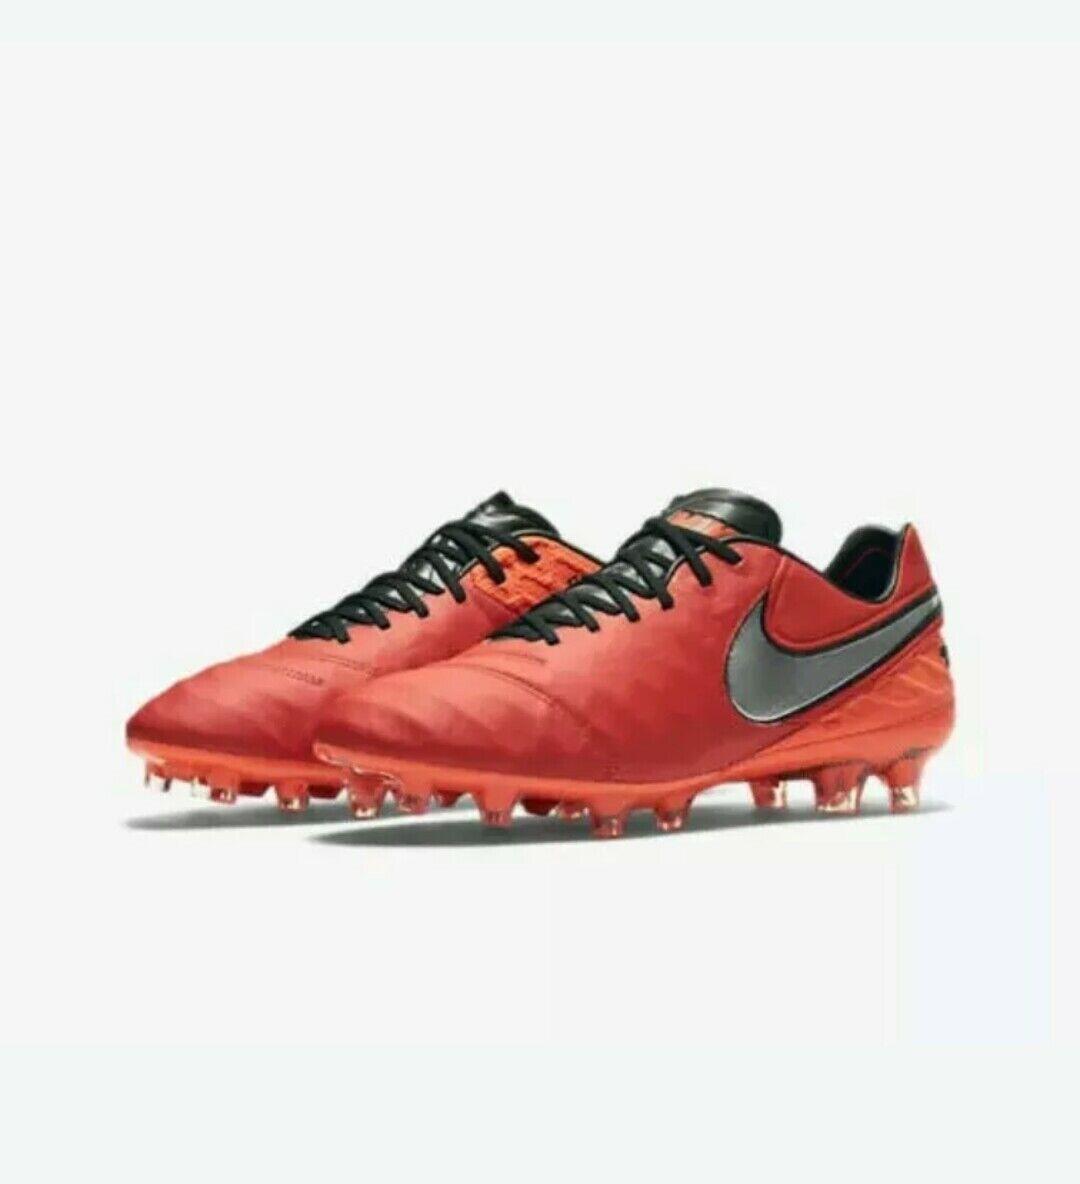 Nike Hombre Tiempo Legend V FG botas de fútbol tamaño de Reino Unido 6 (EUR39)